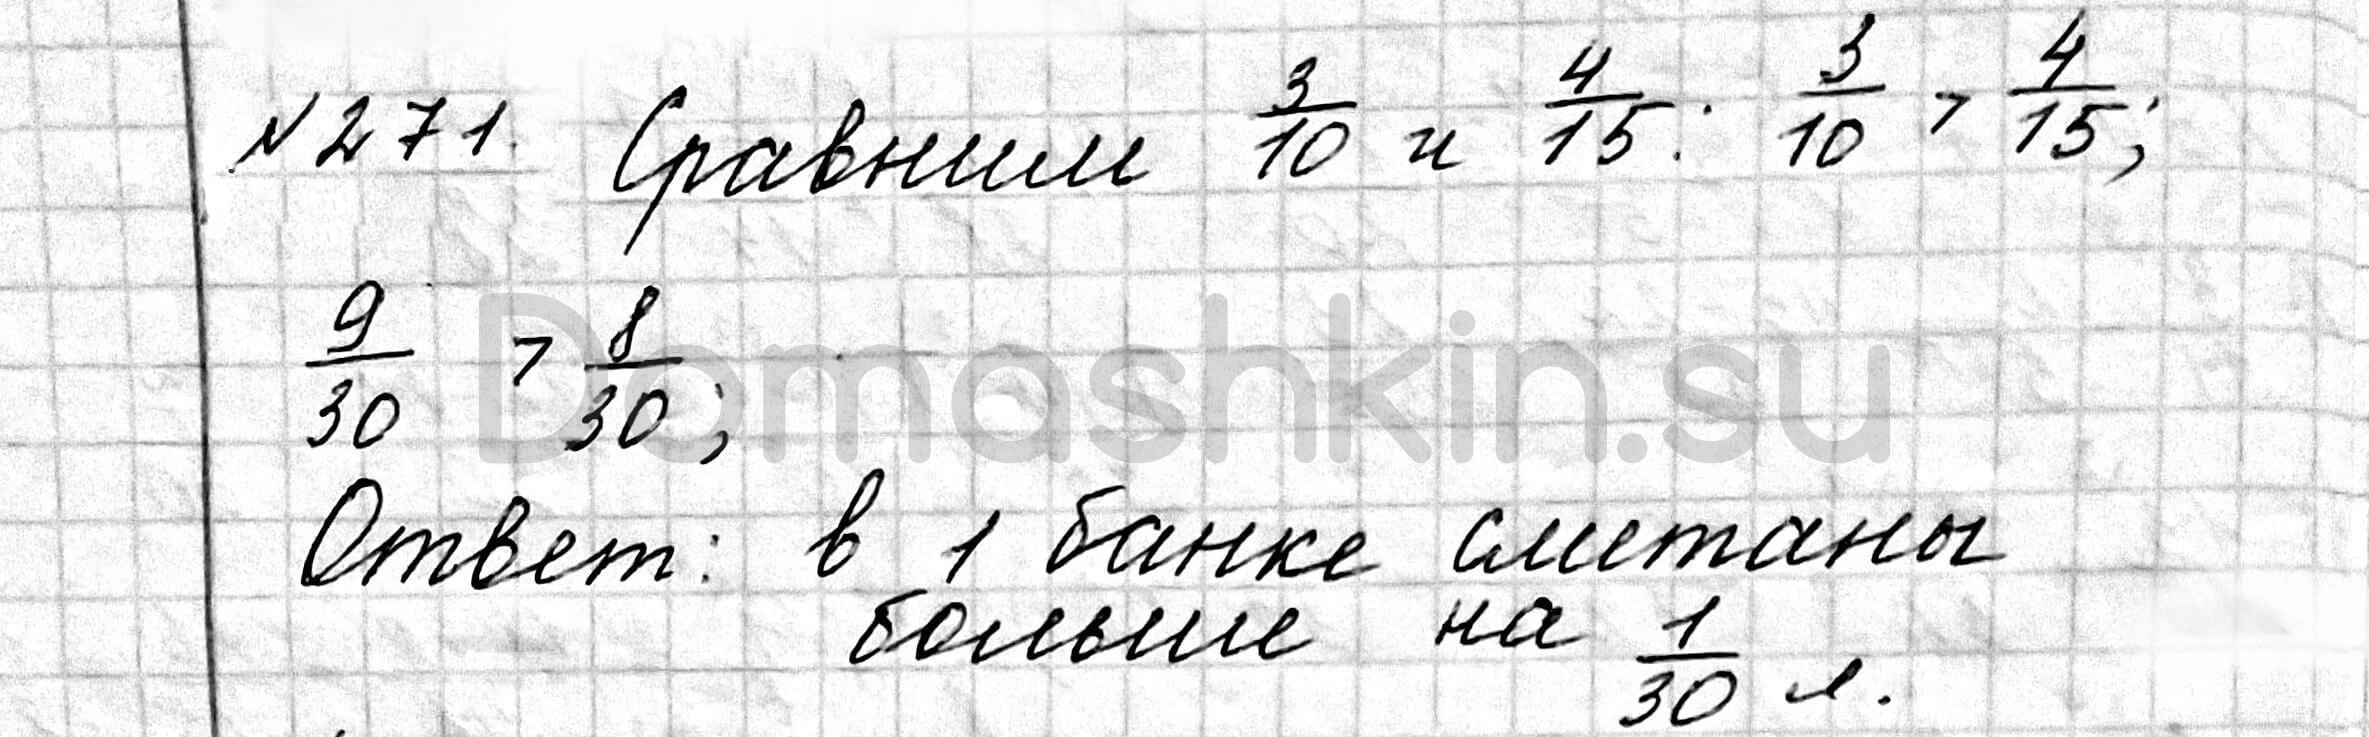 Математика 6 класс учебник Мерзляк номер 271 решение